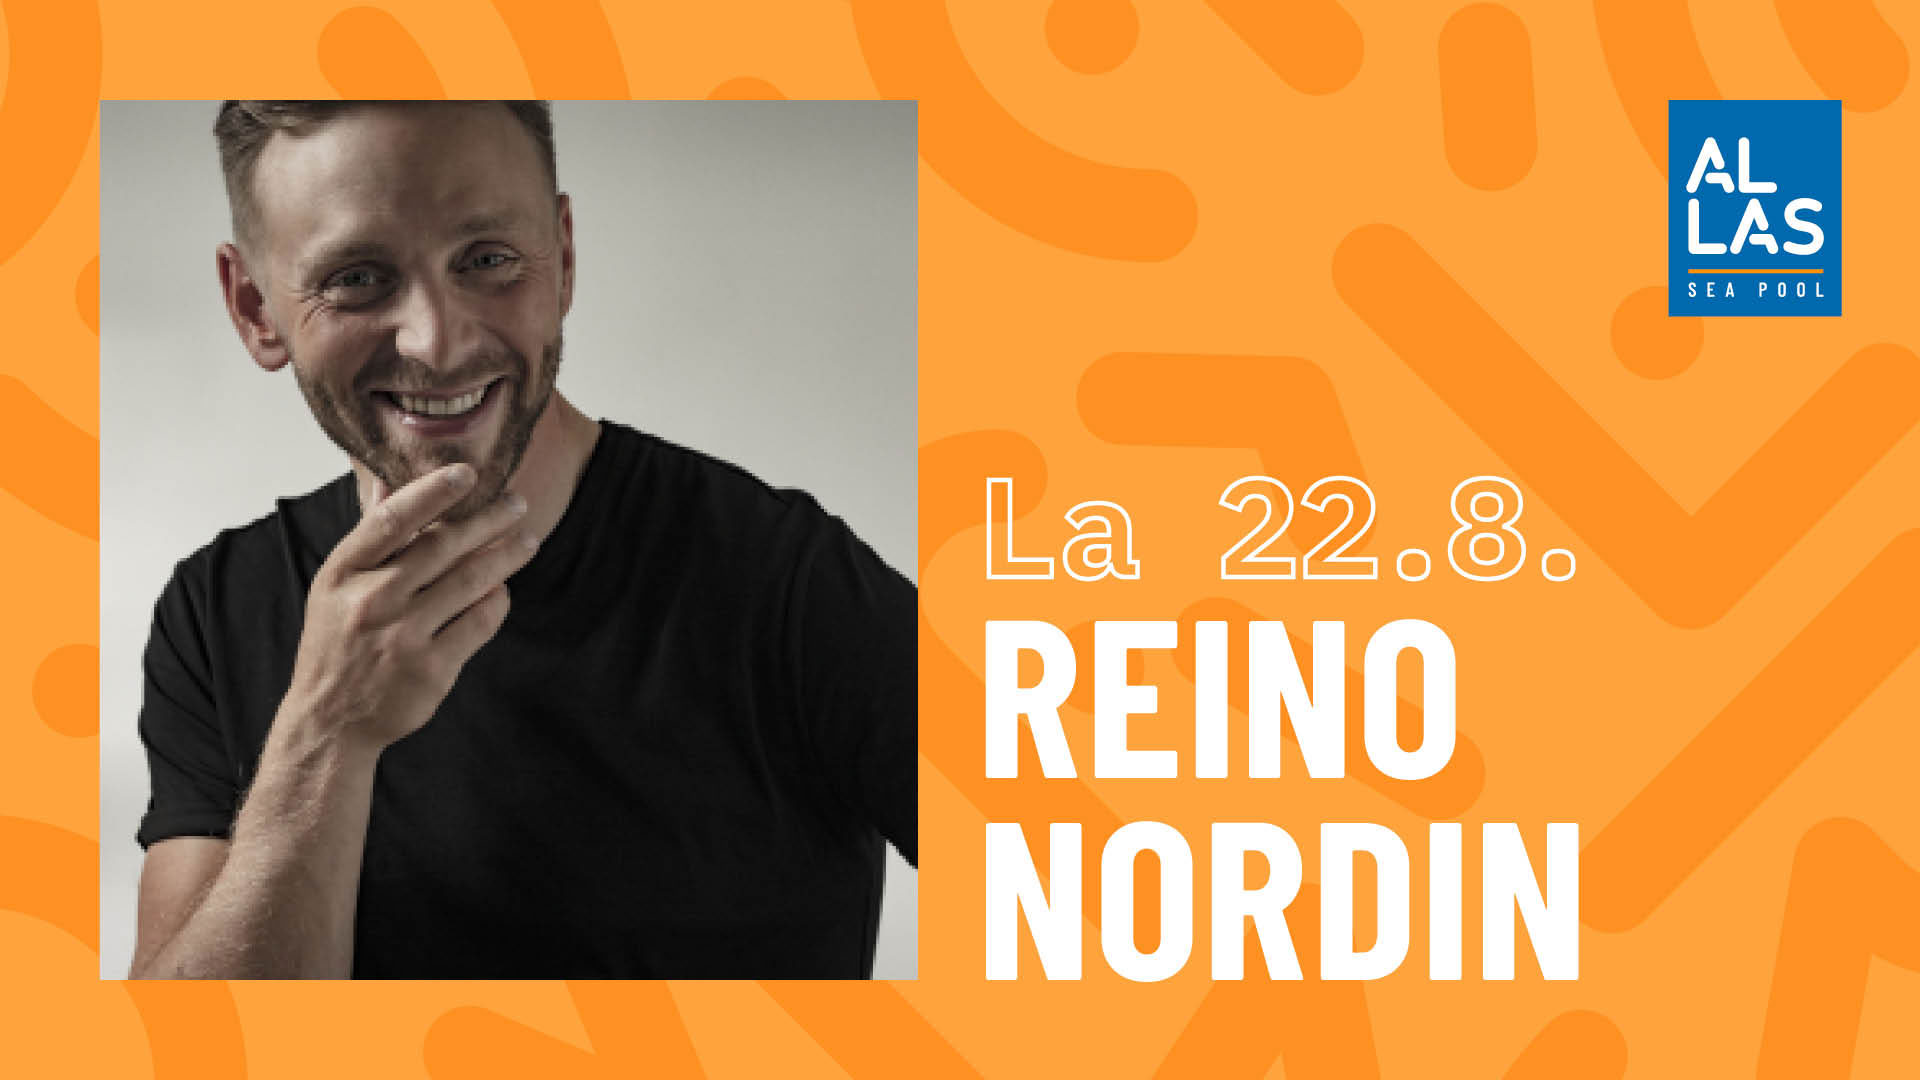 Link to event Allas Live: Reino Nordin